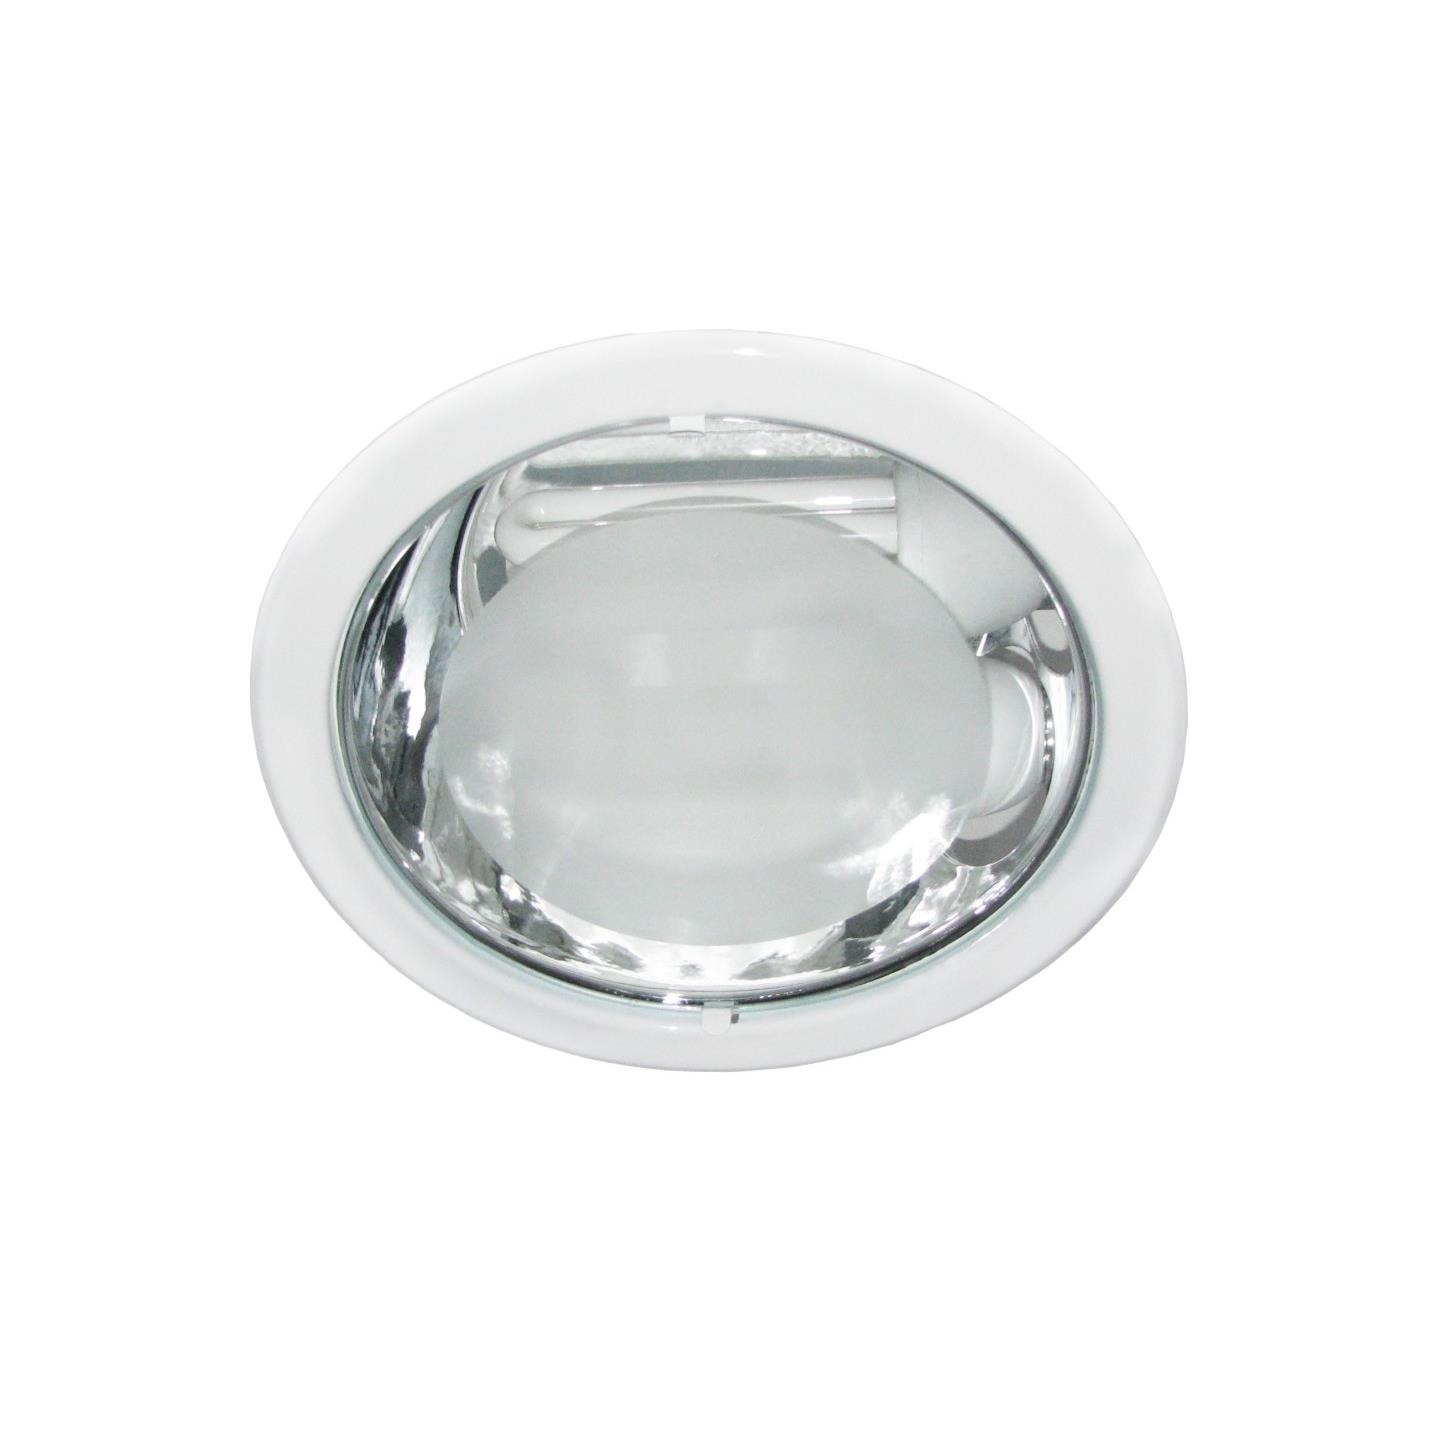 Spot Embutir Aluminio E27 com Vidro 2 Lampadas 1140 - Goli